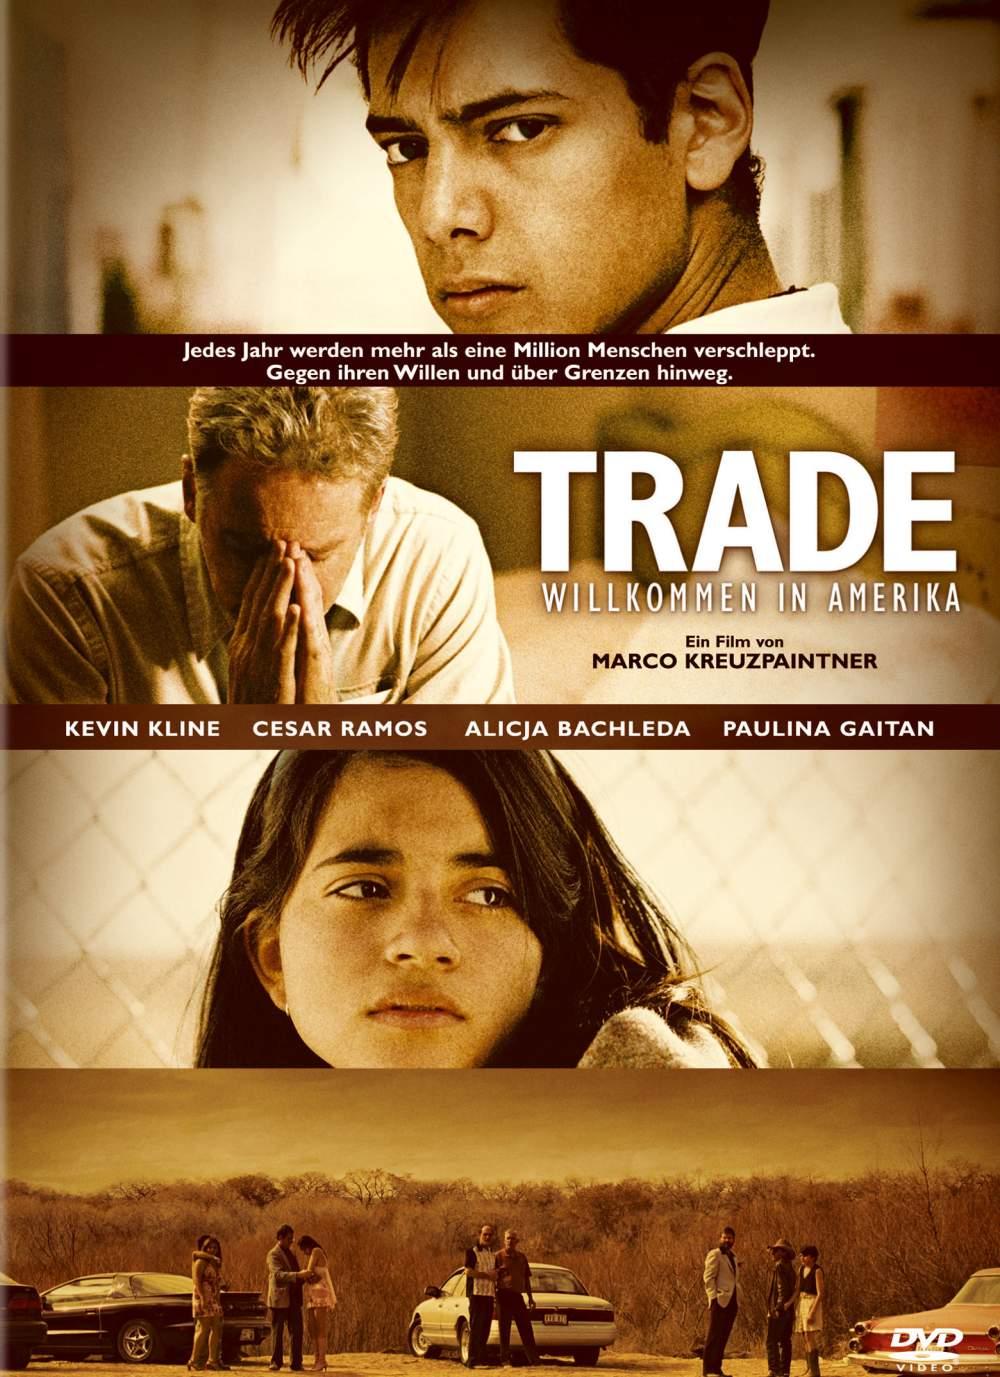 Trade – Willkommen In Amerika